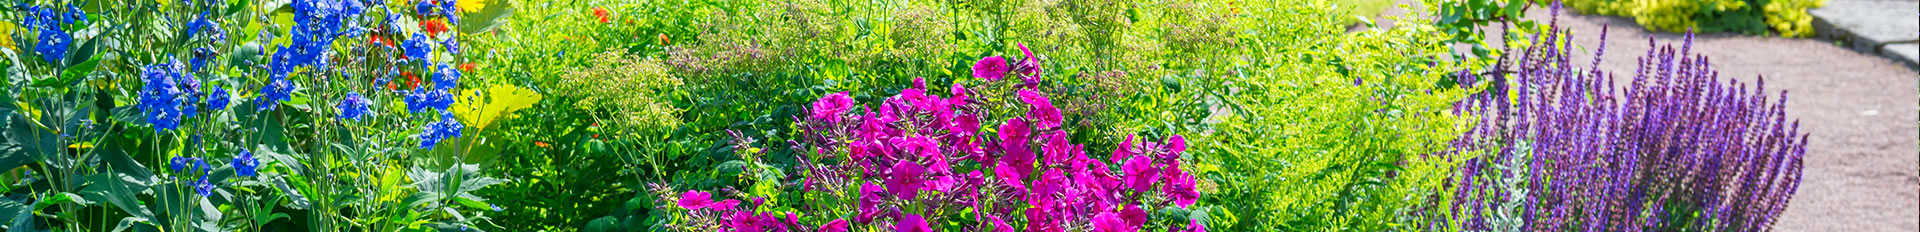 Prices | Pinecrest Memorial Gardens & Crematory